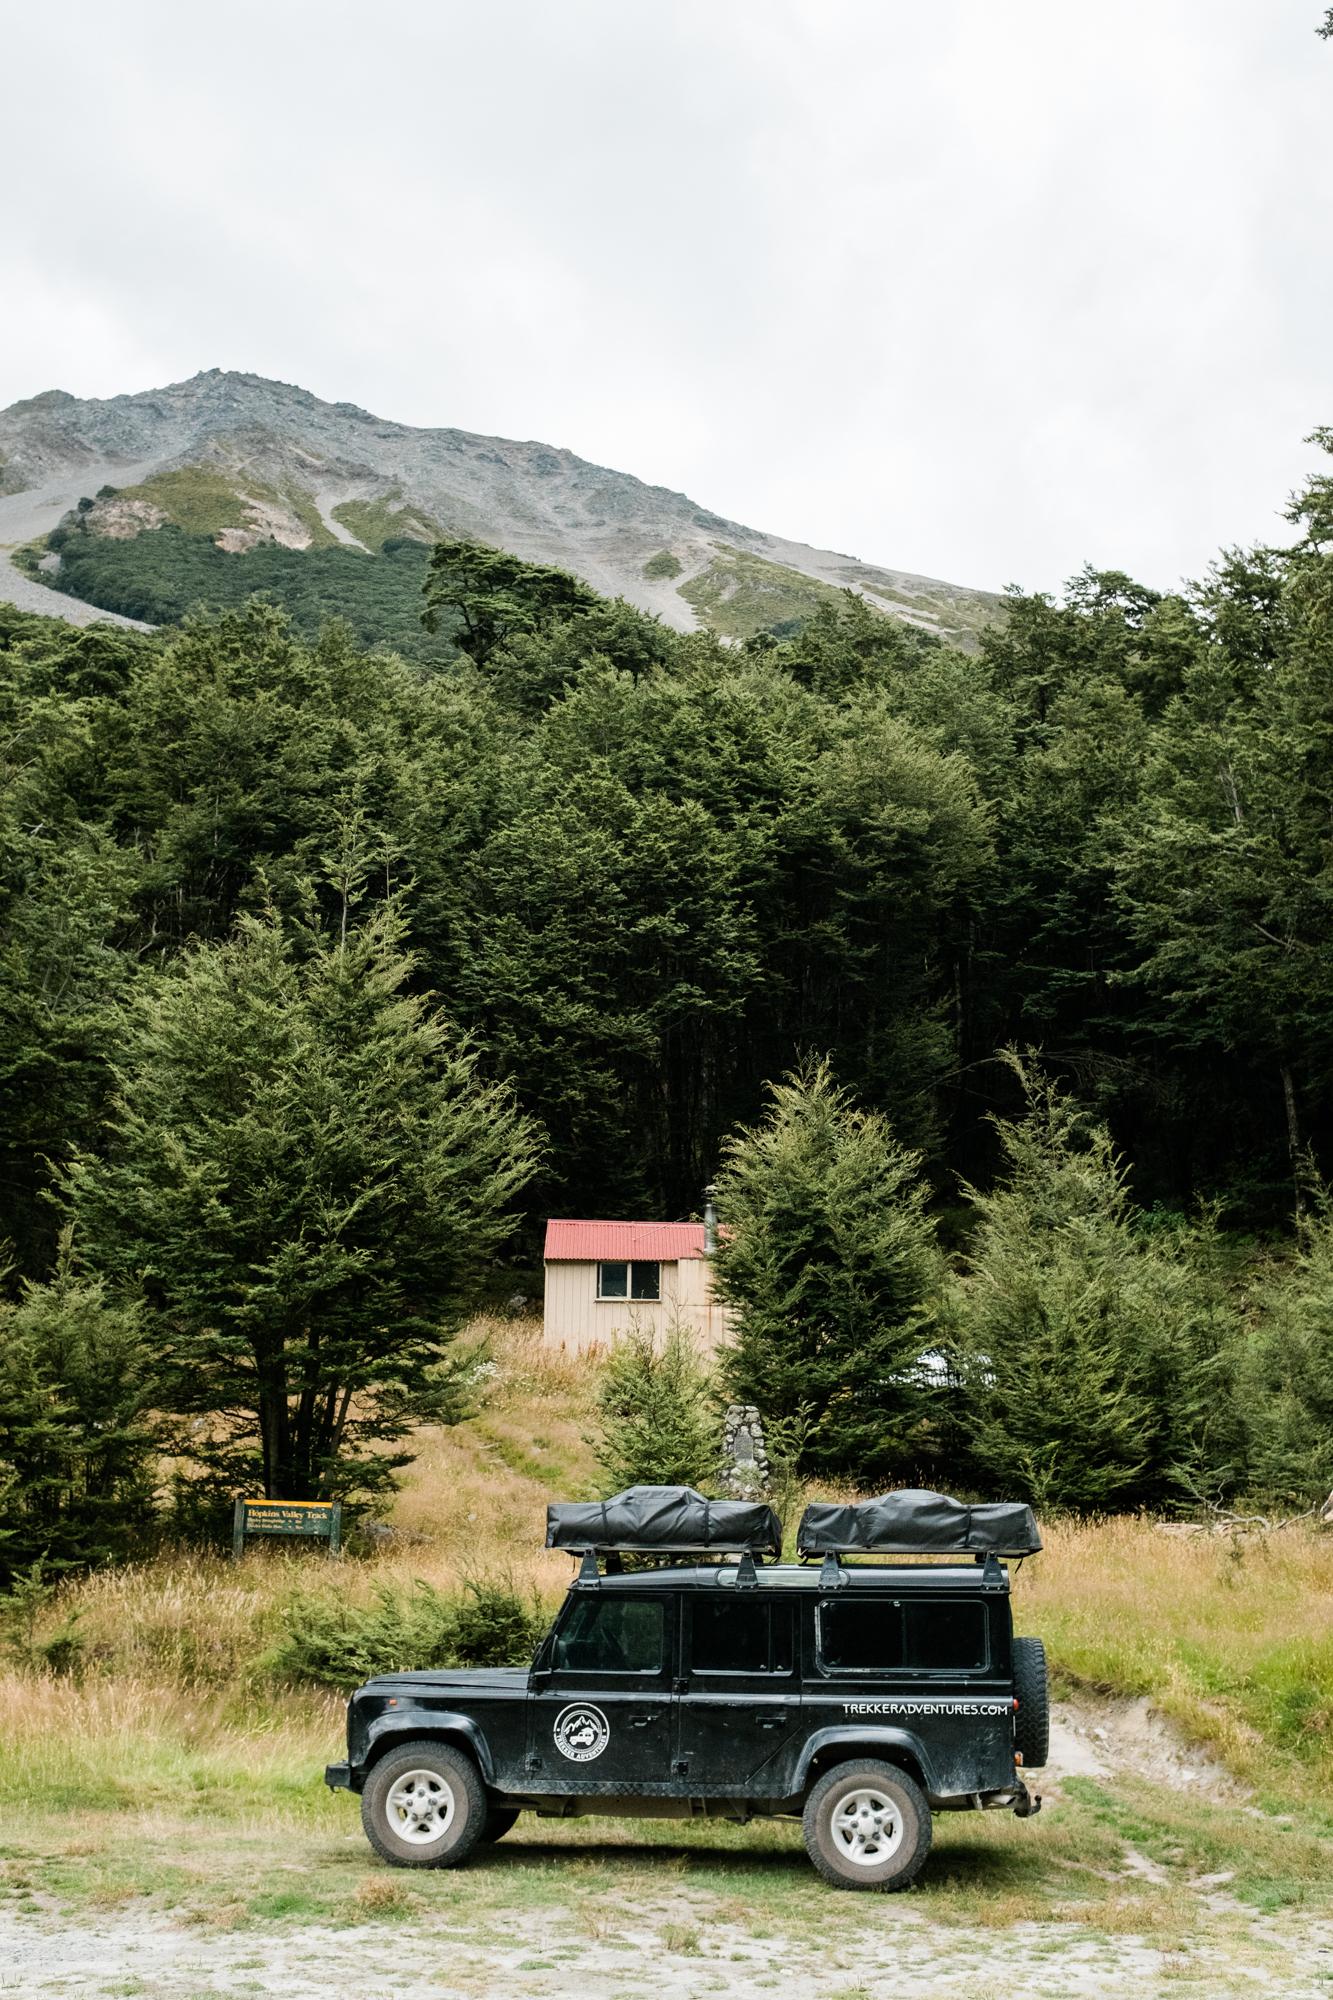 Hütte am Rande des Tals